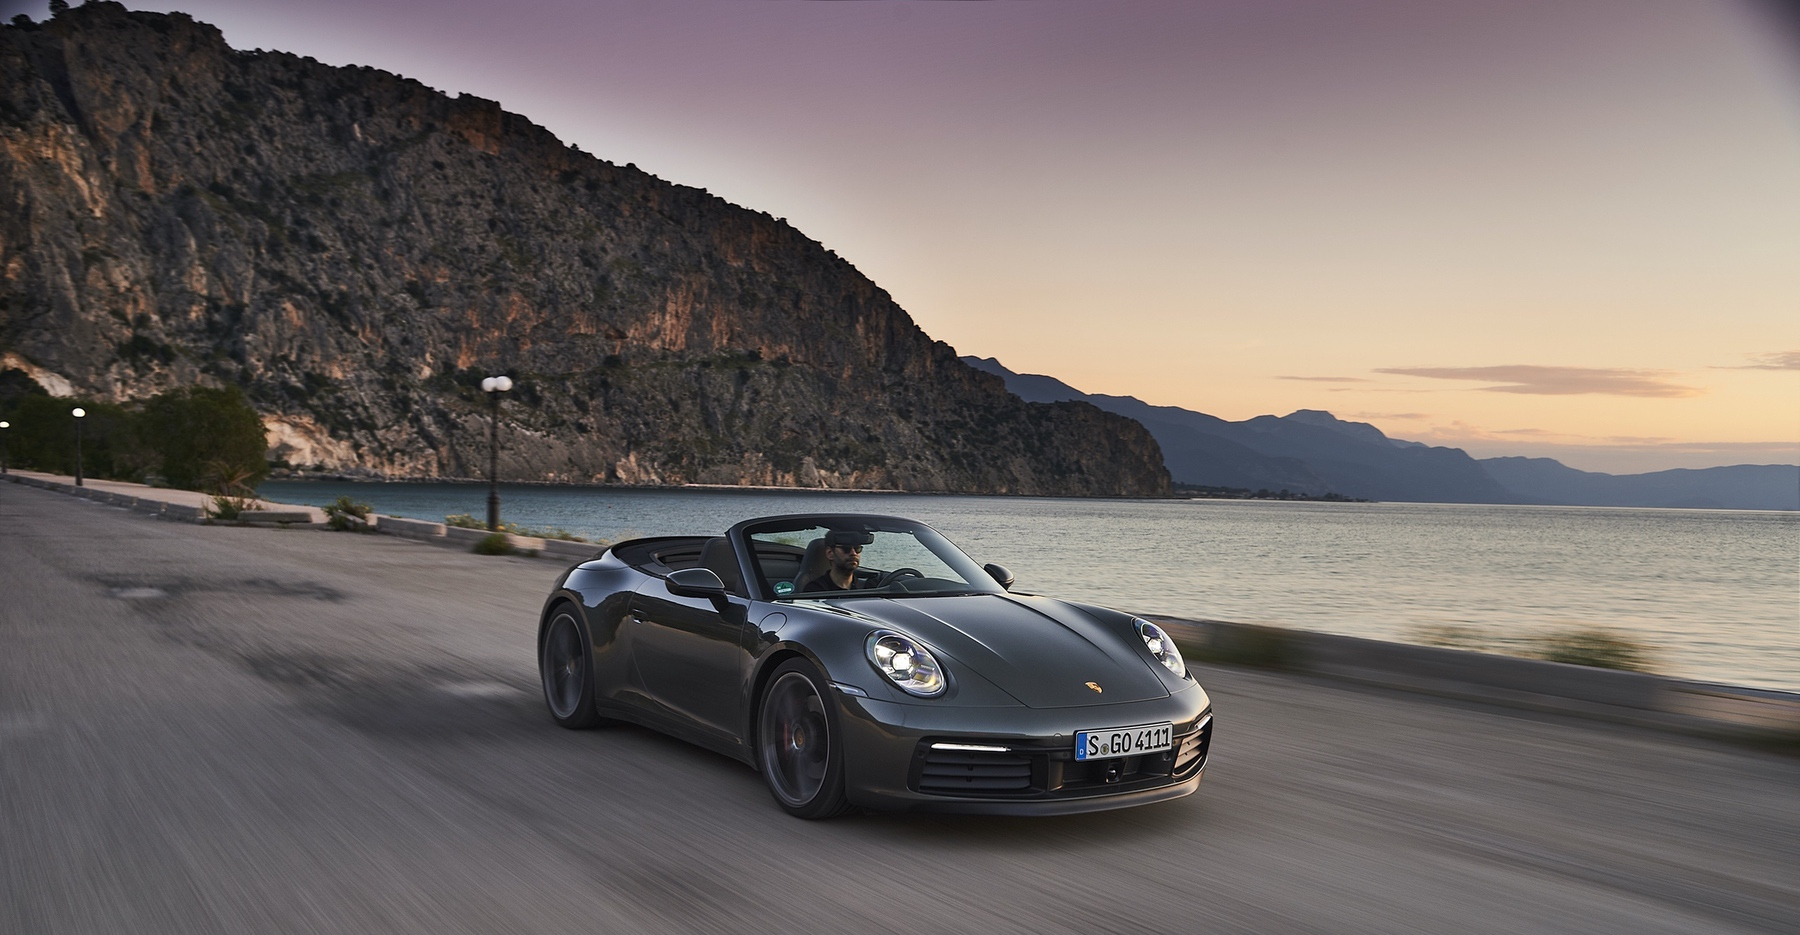 Test_Drive_Porsche_911_Athens_0057